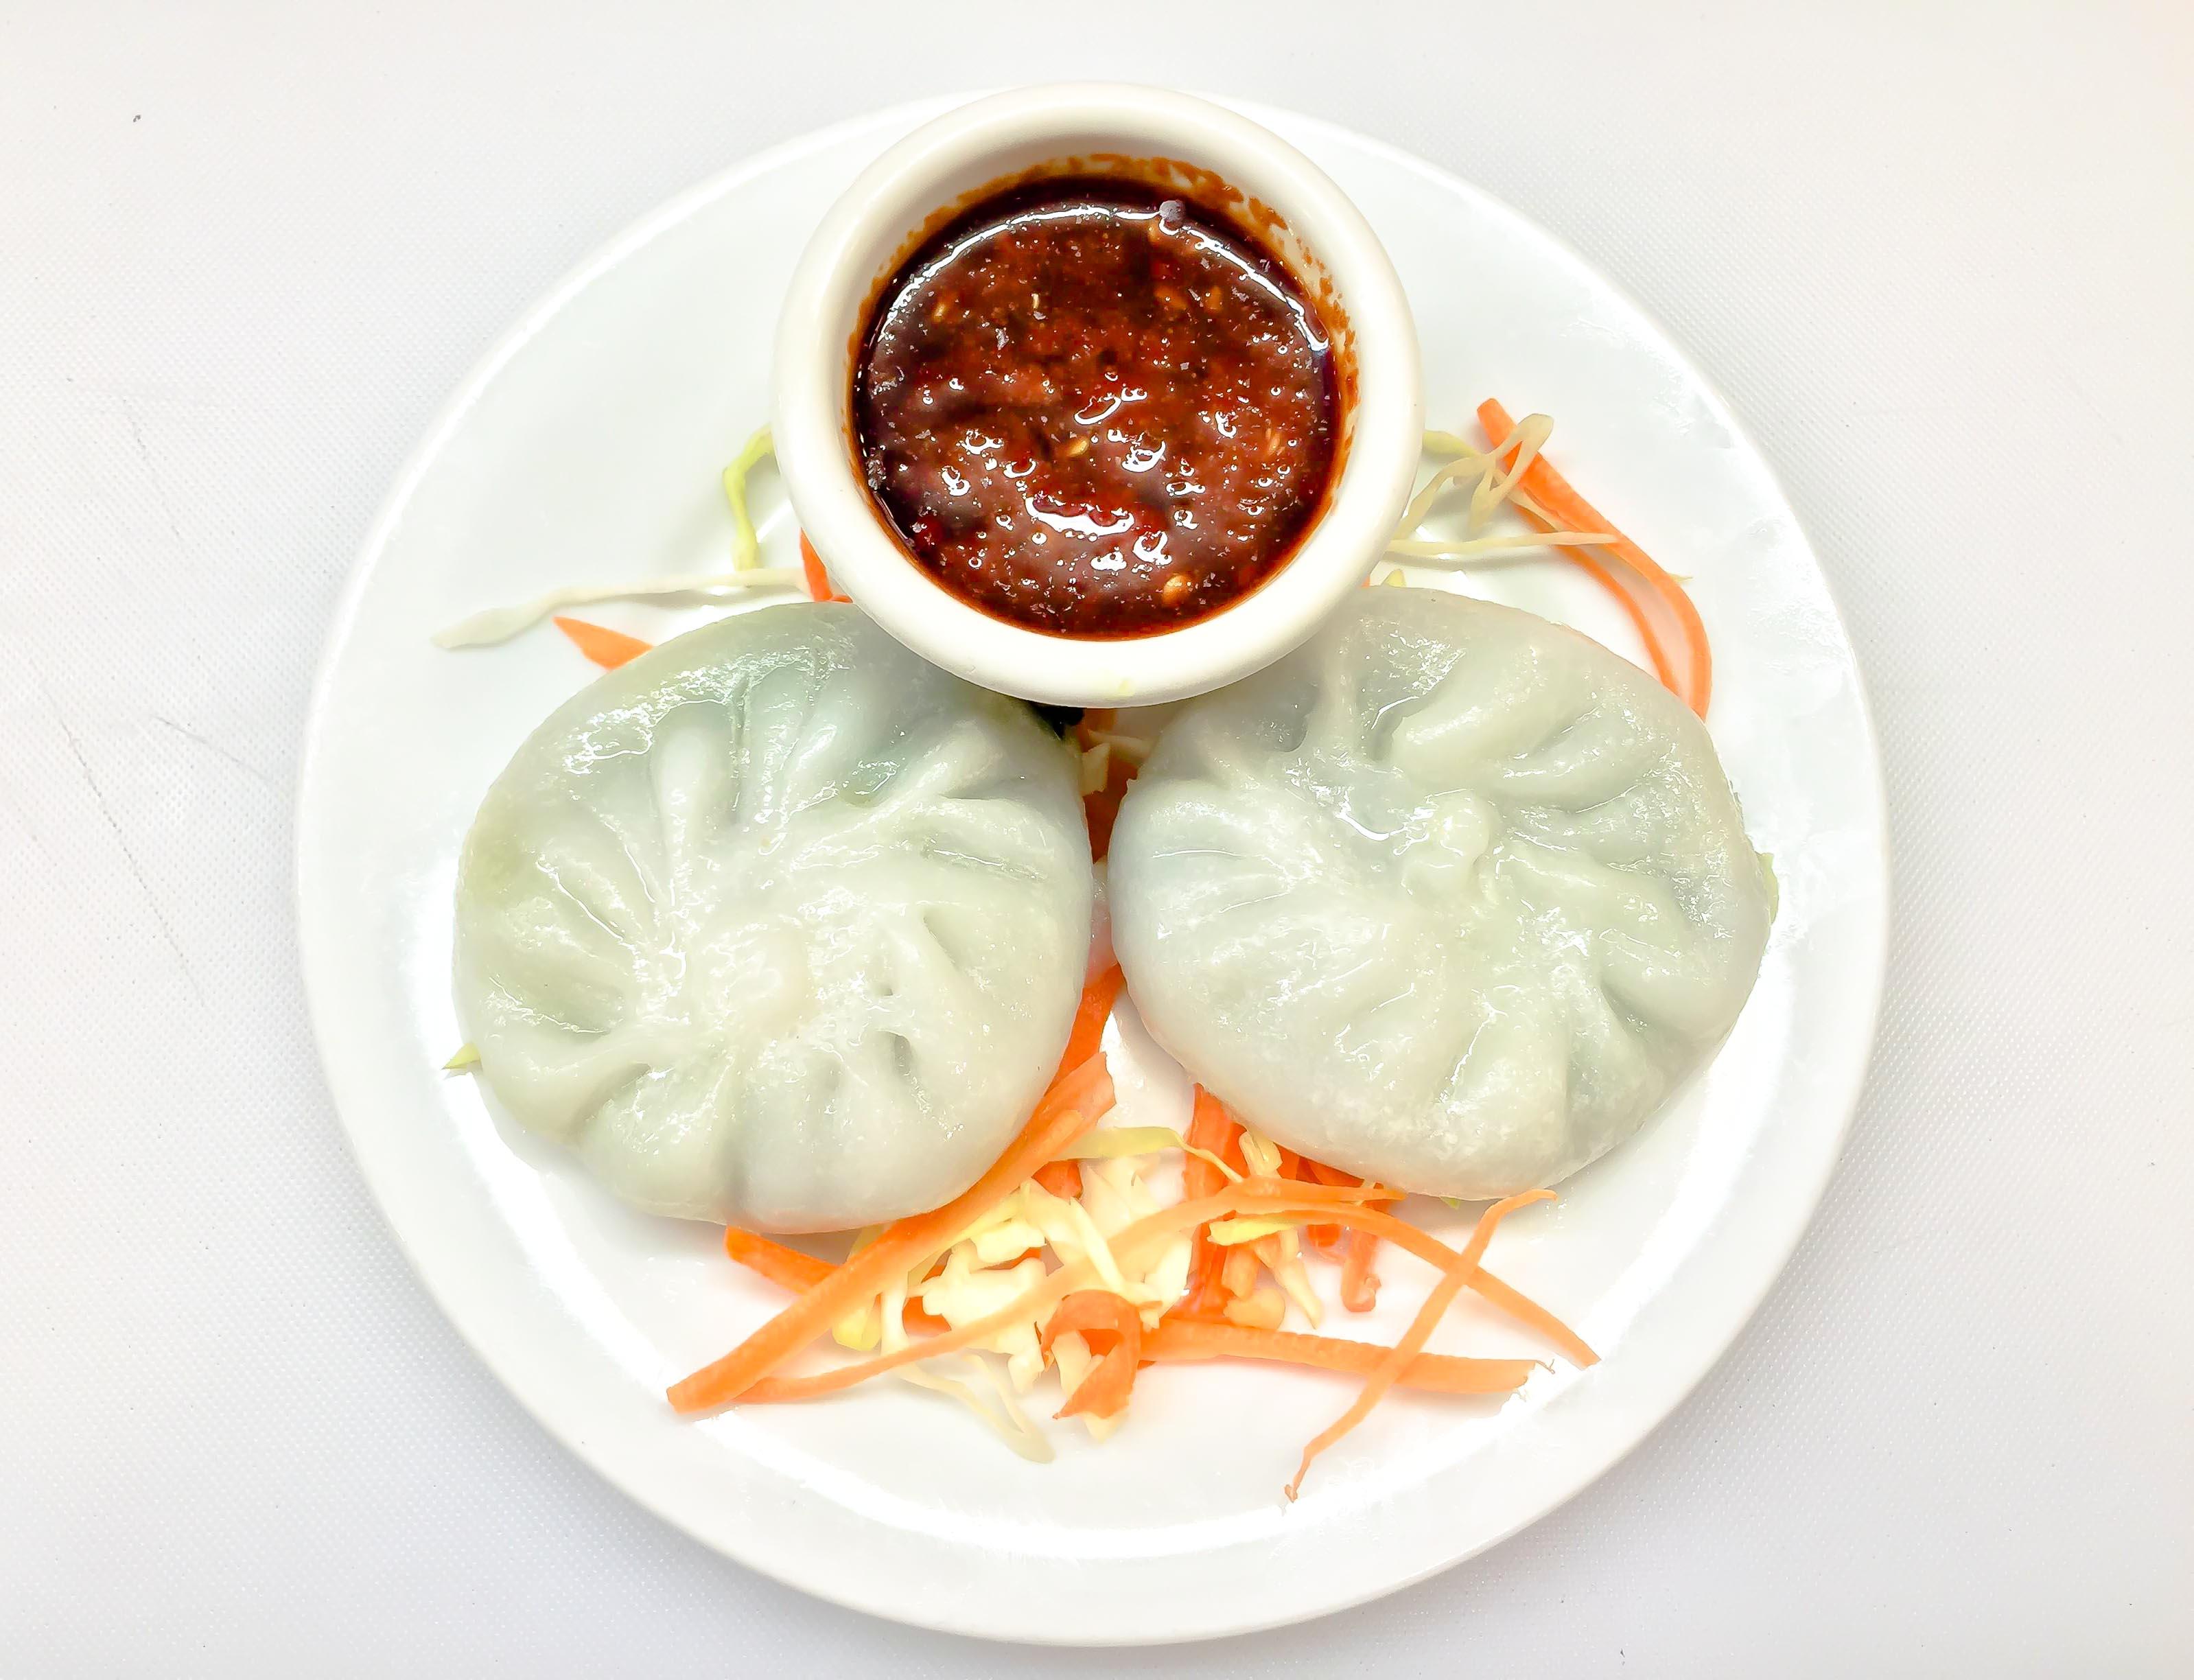 Steamed Vegetable Dumplings 3pcs Image